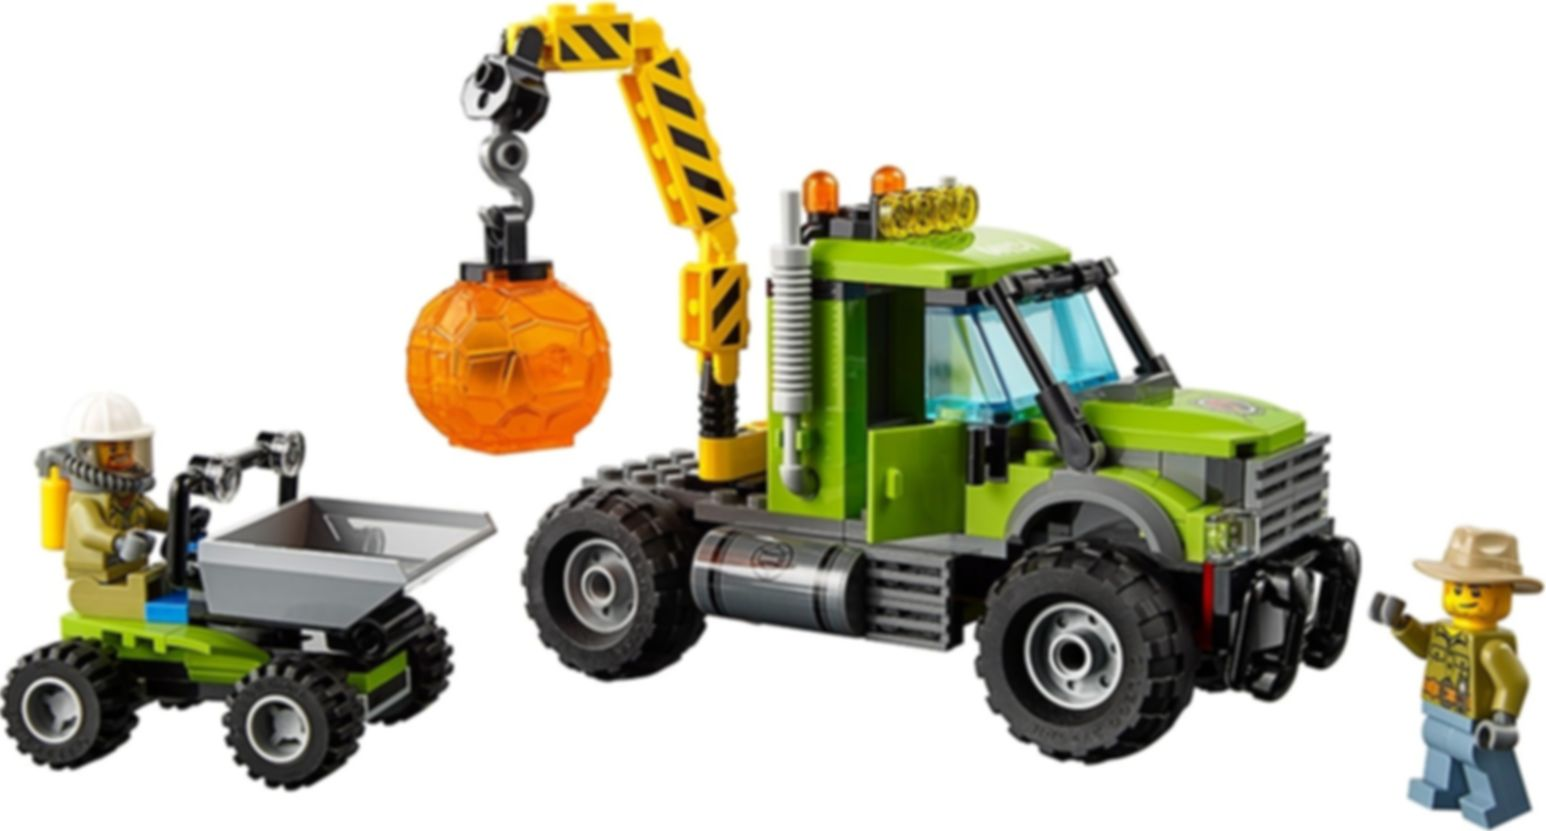 LEGO® City Volcano Exploration Base gameplay